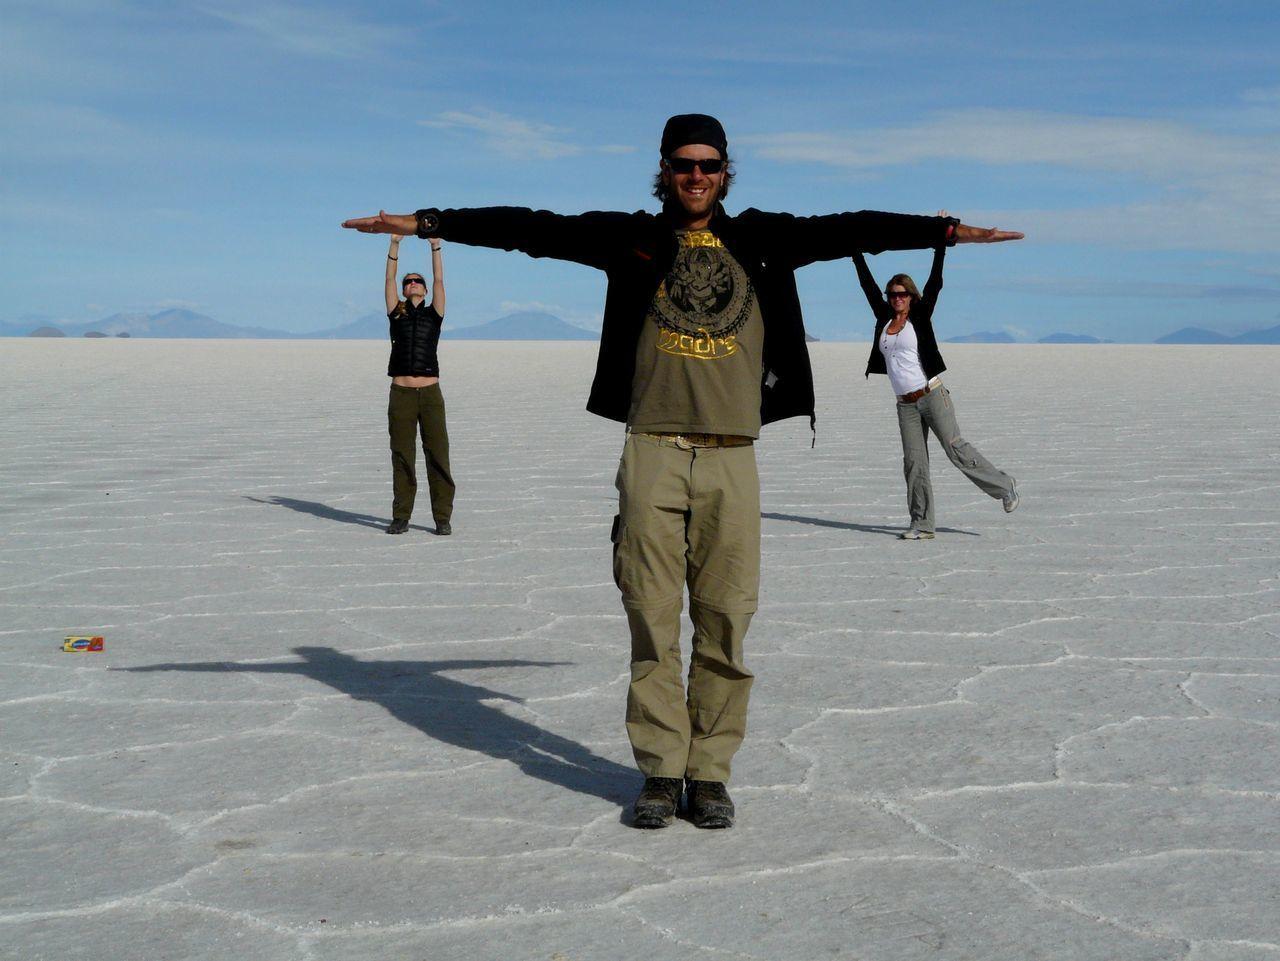 Optical illusion of women hanging on man arms in white desert